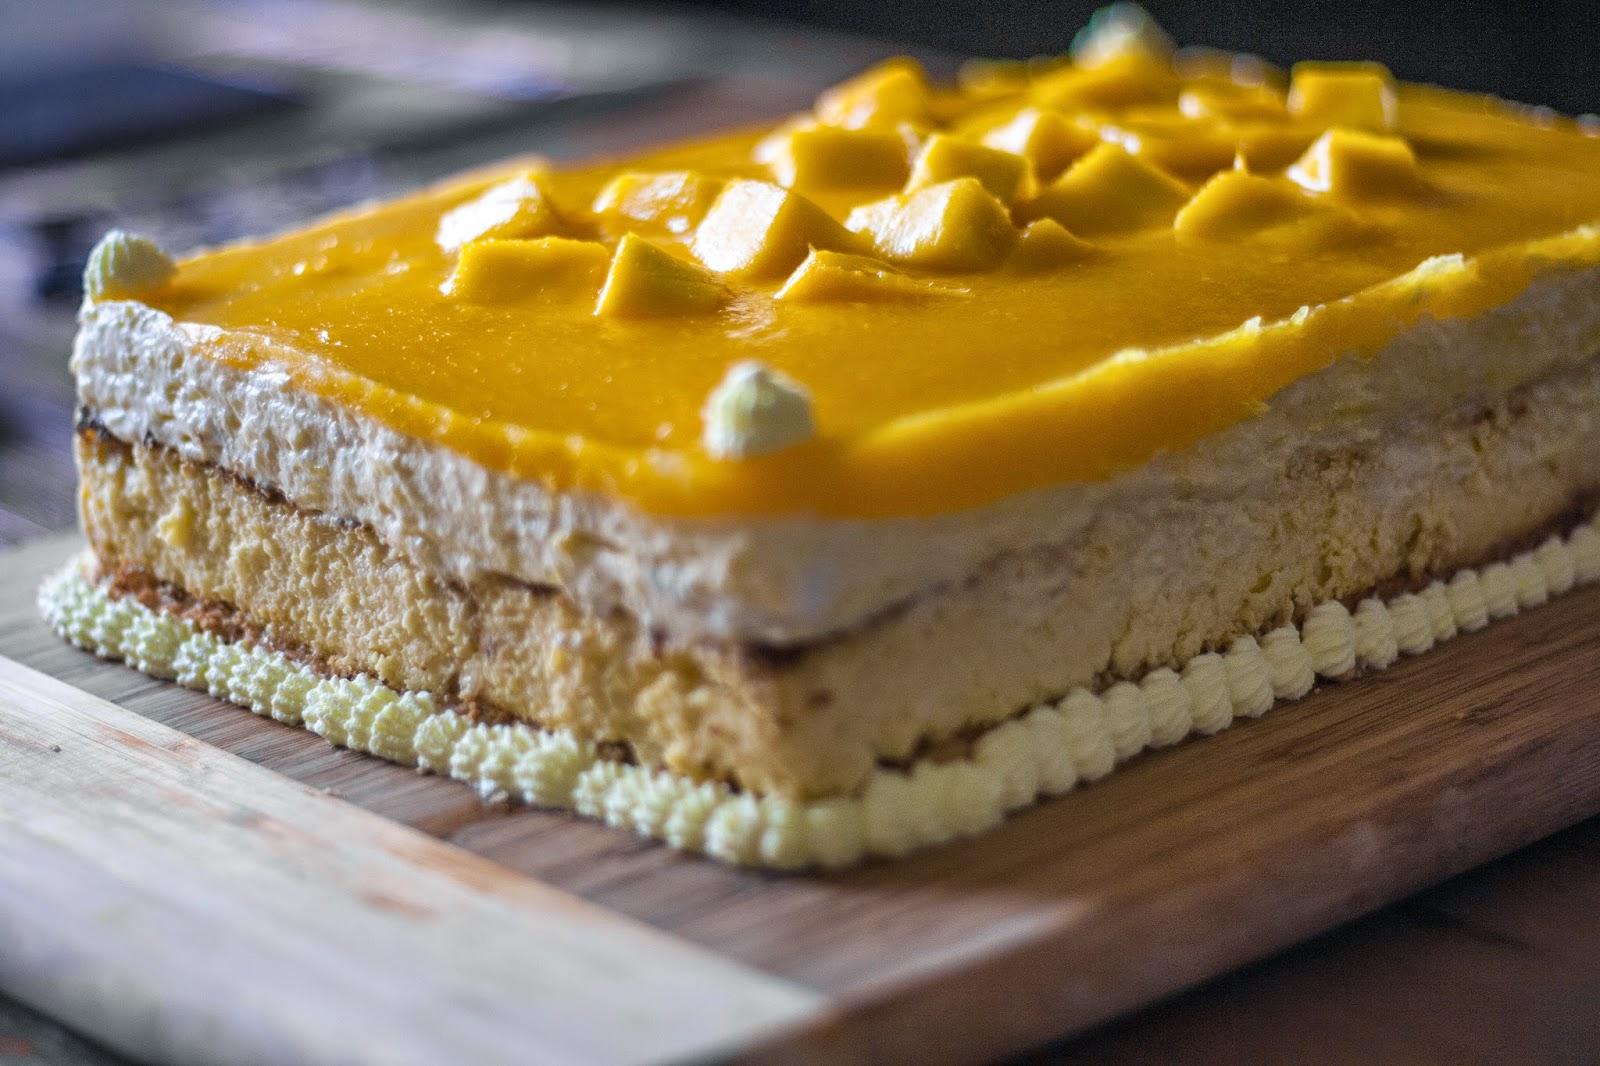 Oxytocin: Gluten-Free Mango Mousse Cheesecake